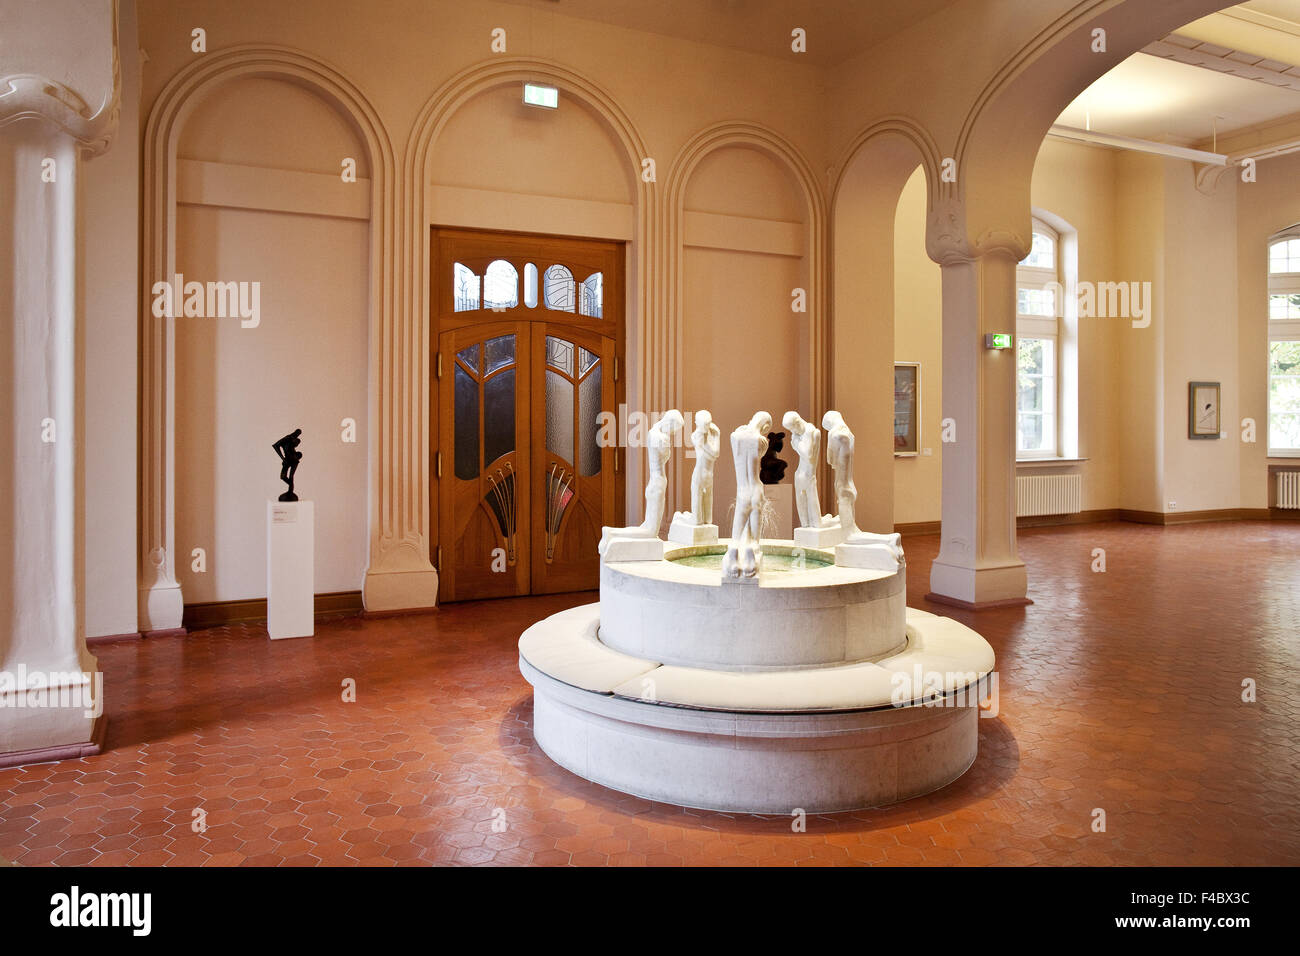 Karl Ernst Osthaus Museum, Hagen, Germany - Stock Image